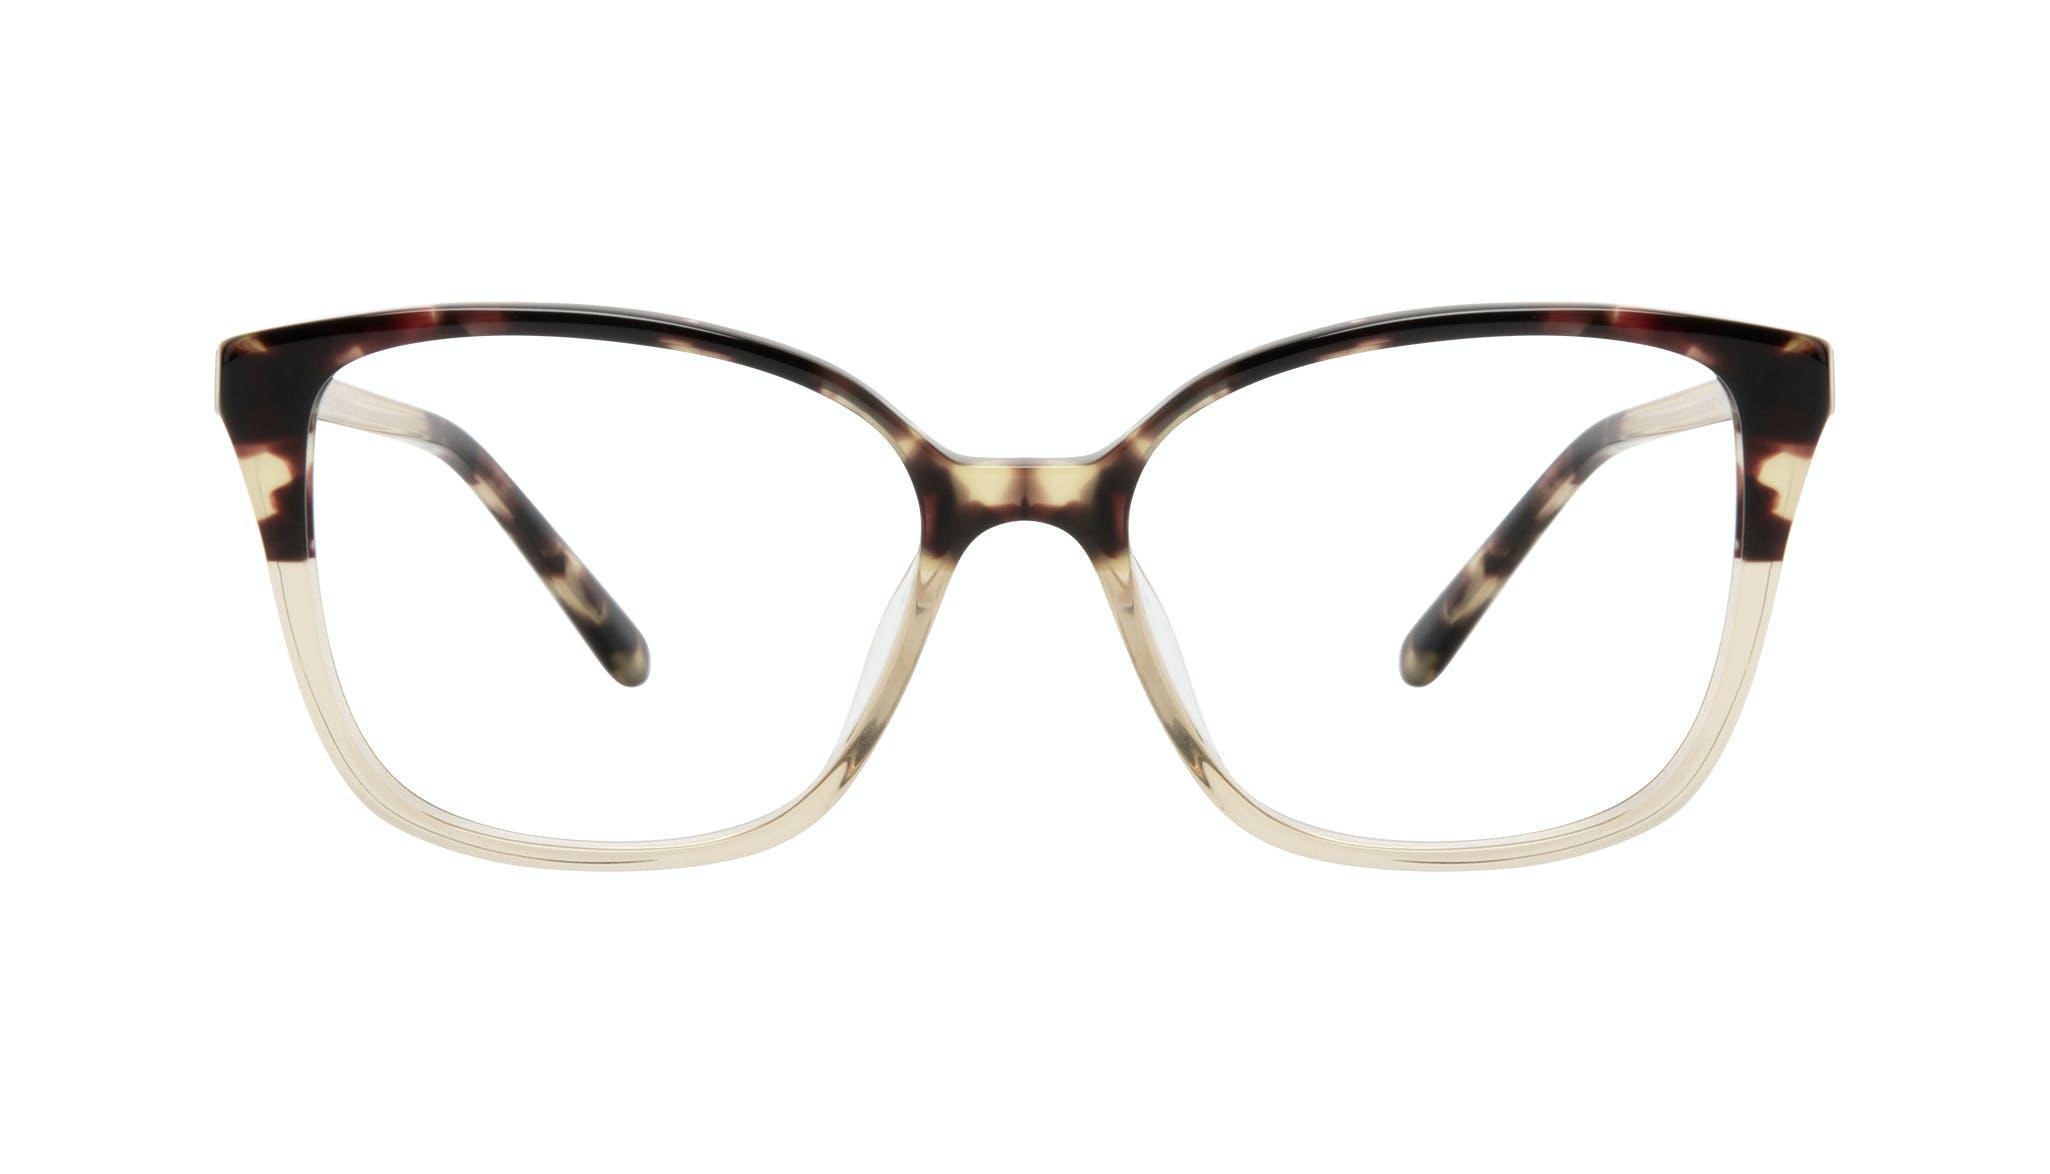 Affordable Fashion Glasses Square Eyeglasses Women Only Golden Tort Front